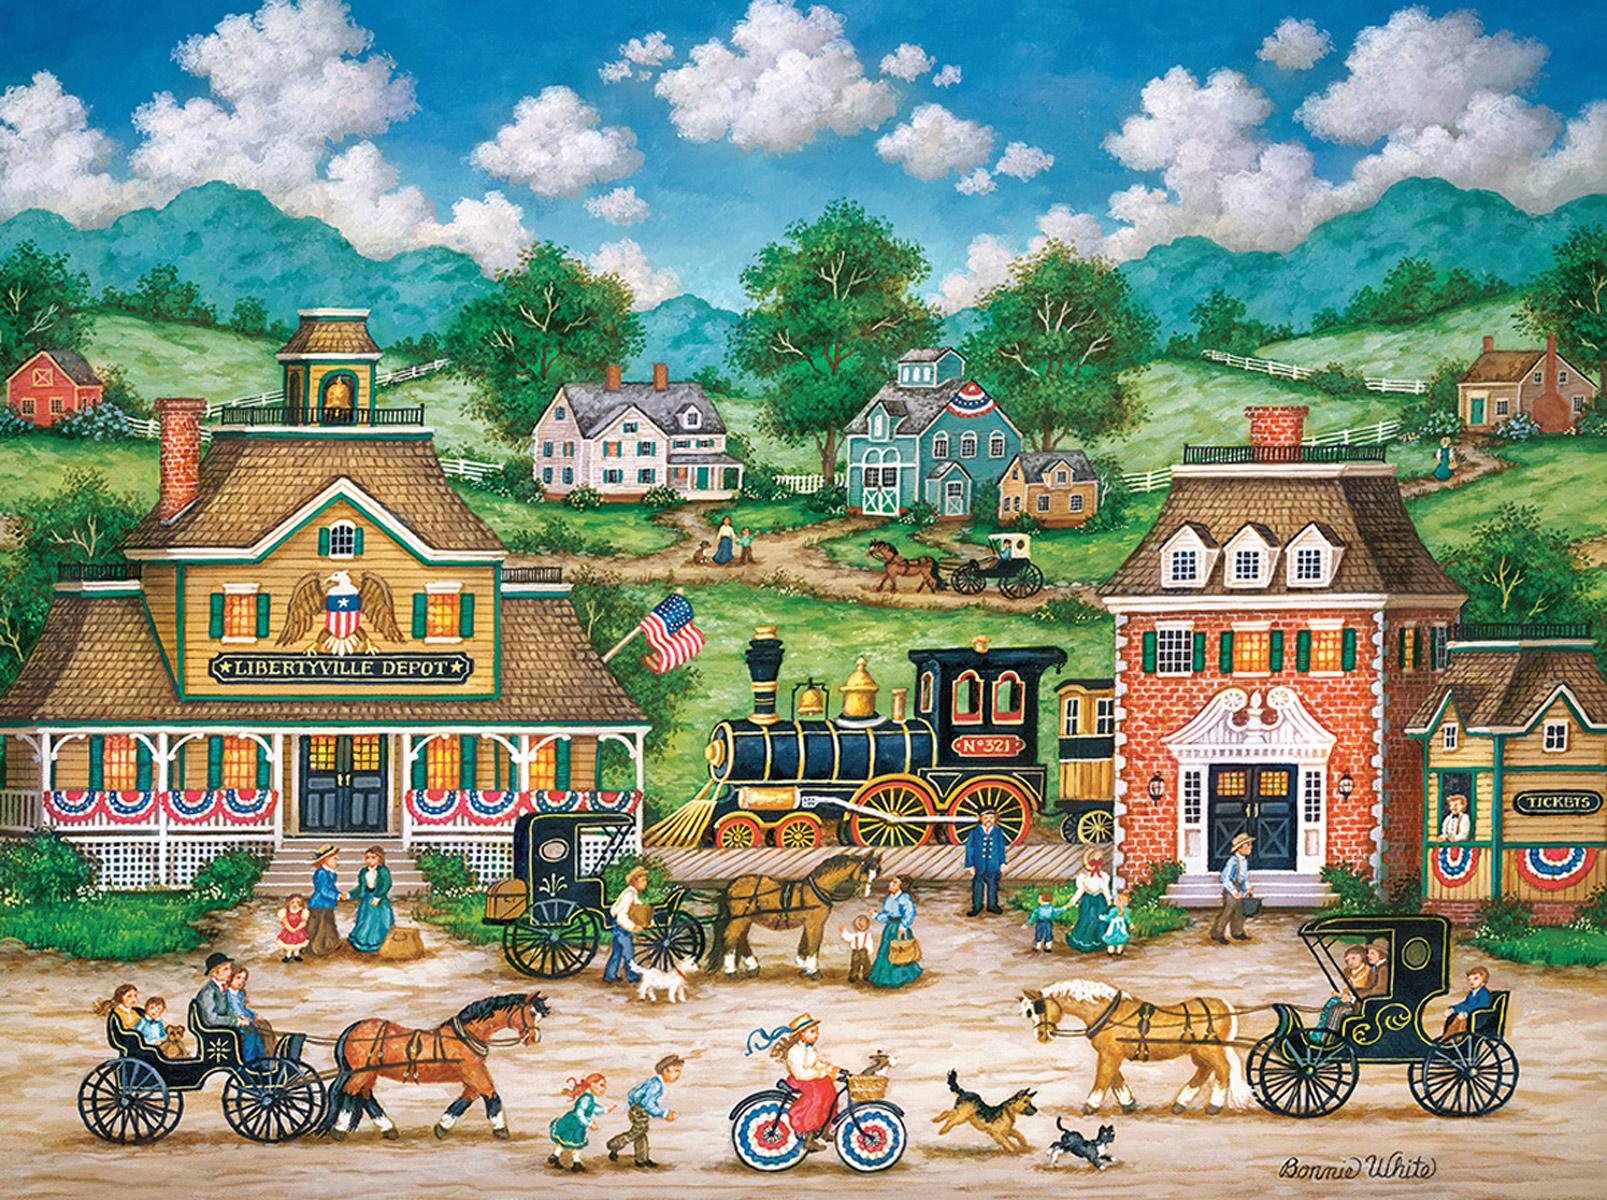 Libertyville Depot Patriotic Jigsaw Puzzle